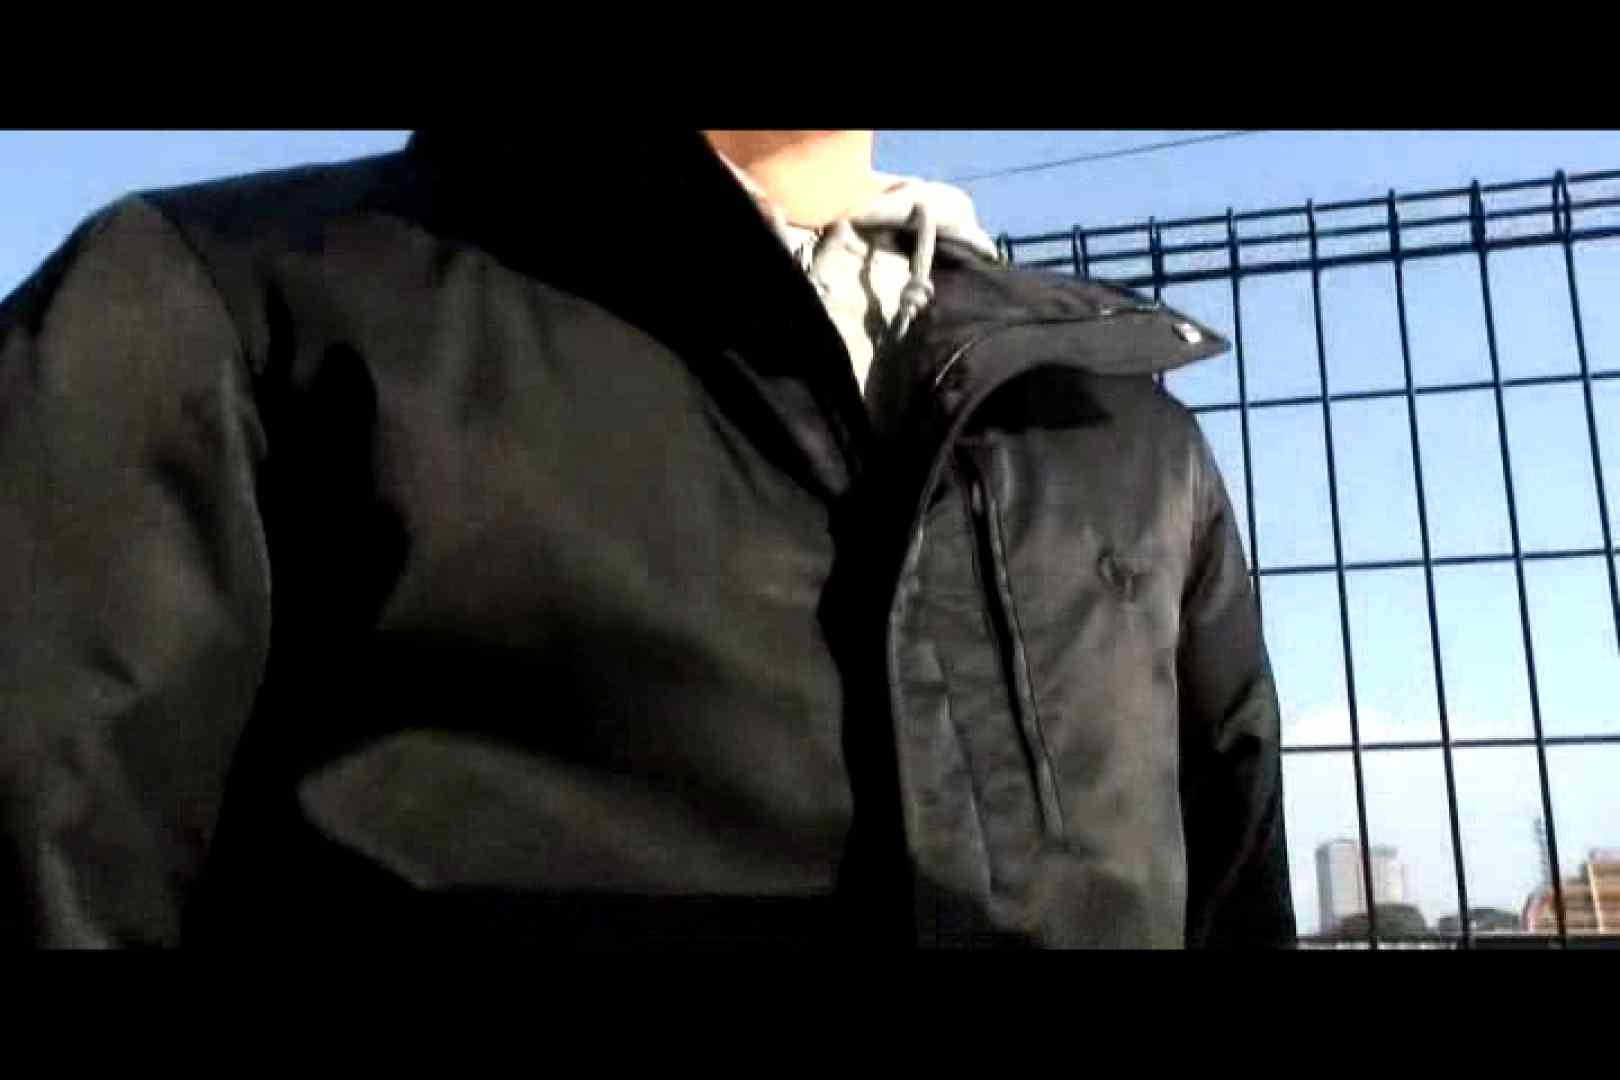 Bistro「イケメン」~Mokkori和風仕立て~vol.01 プレイ動画 ゲイセックス画像 111pic 17